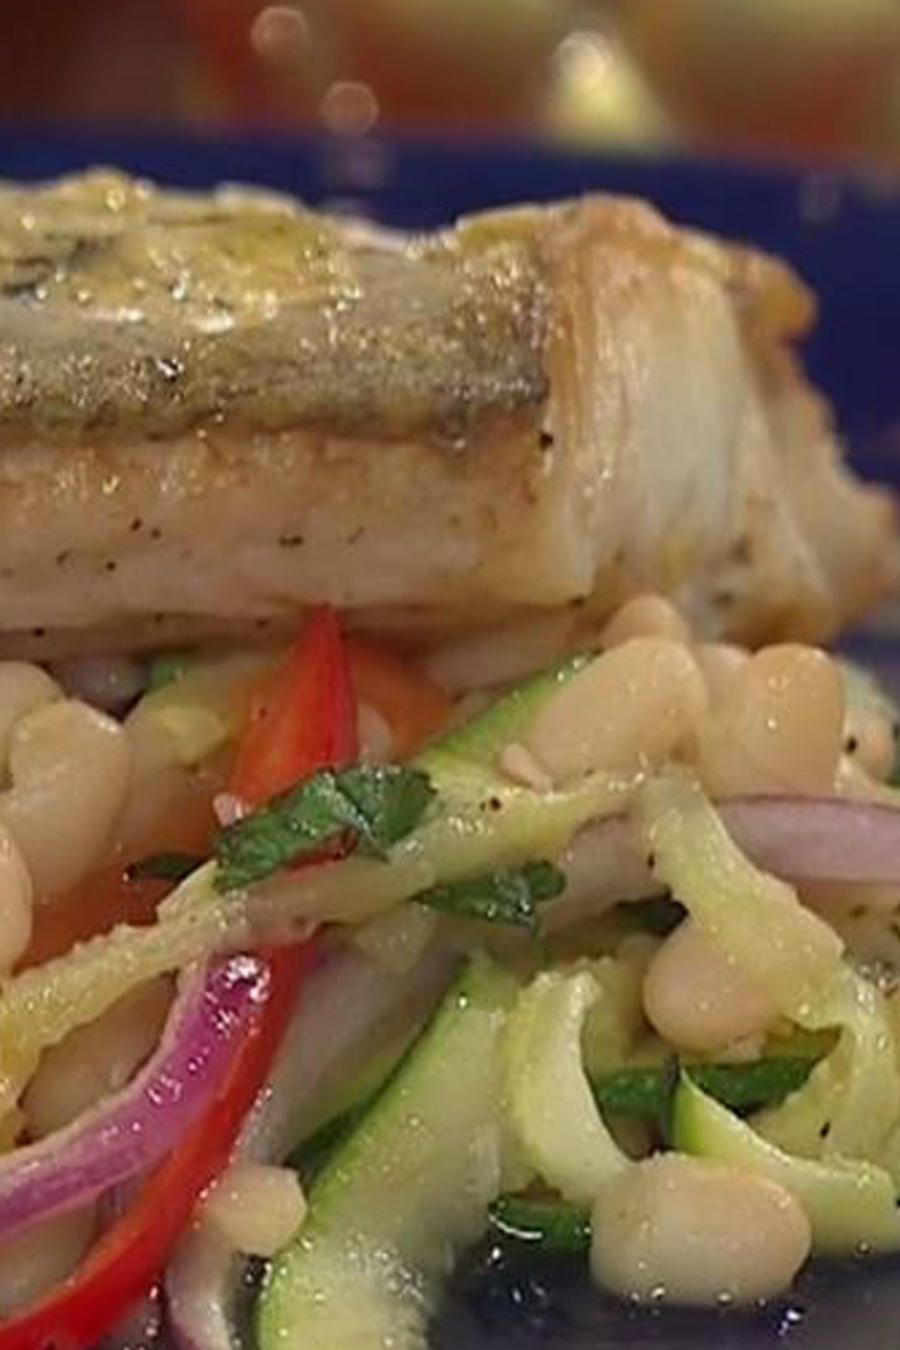 Recetas de cocina: Pescado con ensalada de frijoles